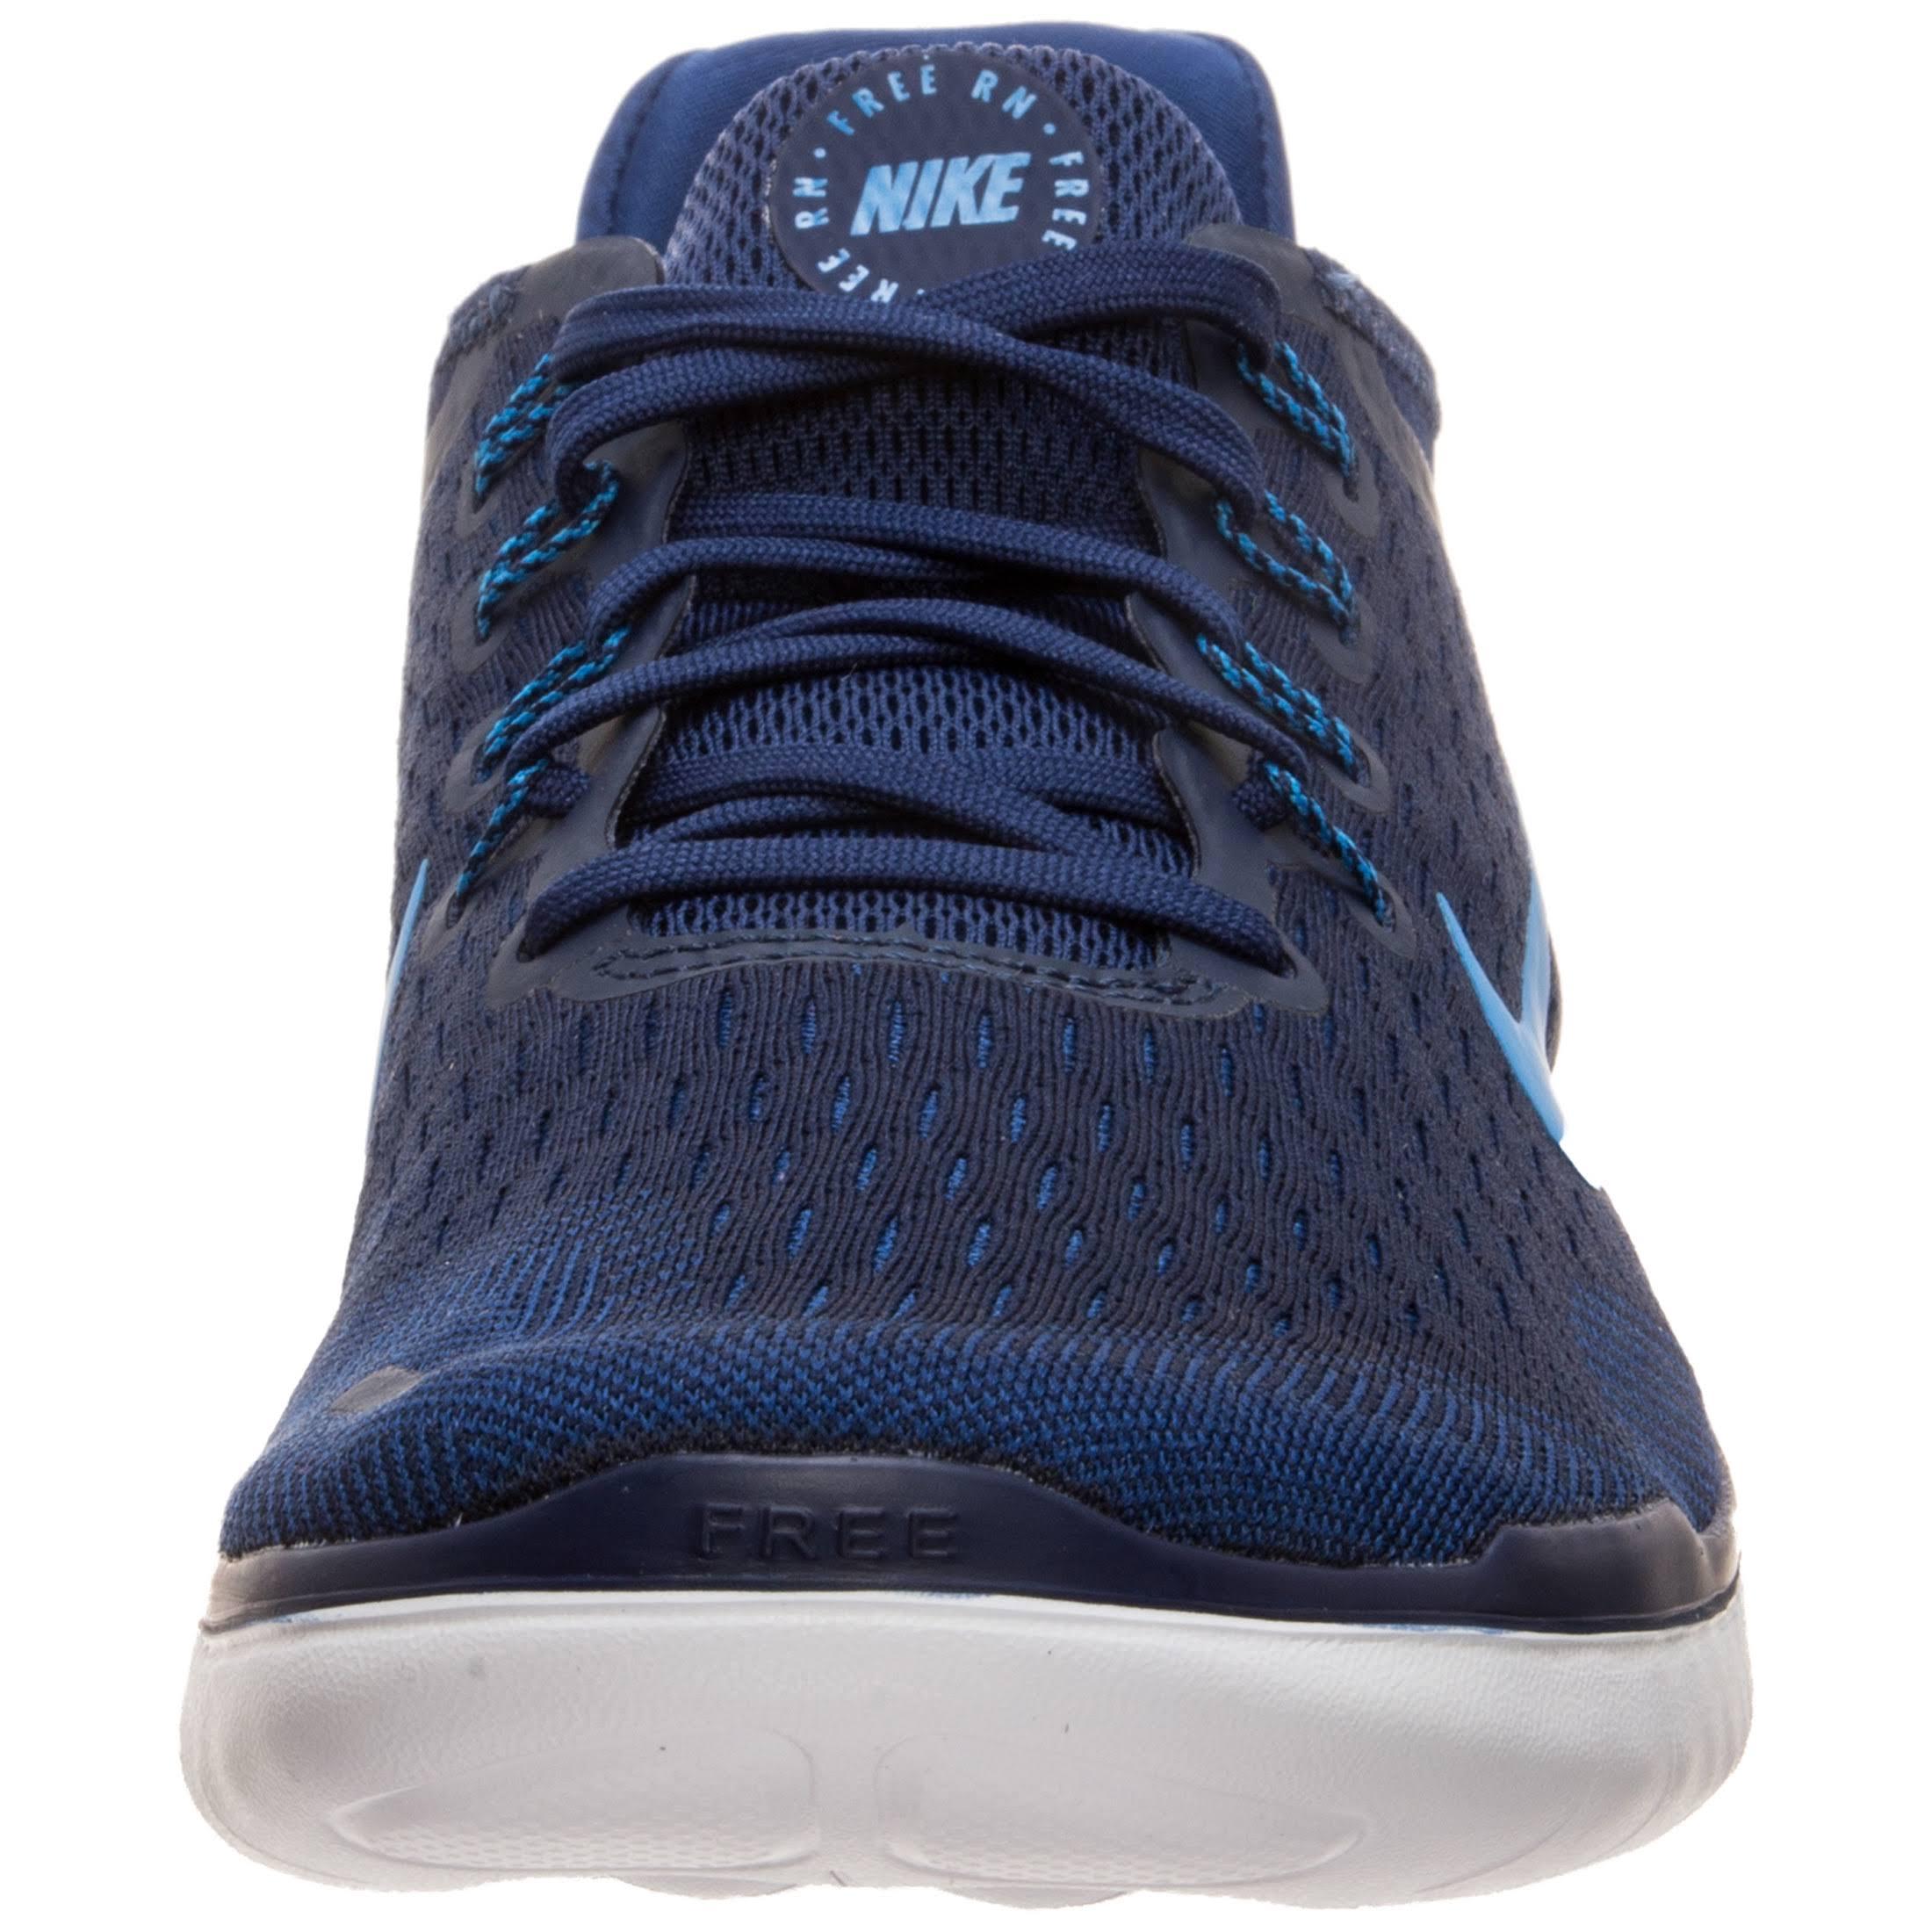 Navy Laufschuhe 42 Blau Nike 2018 In blau Größe Herren Free Run Rnz5TwgqH